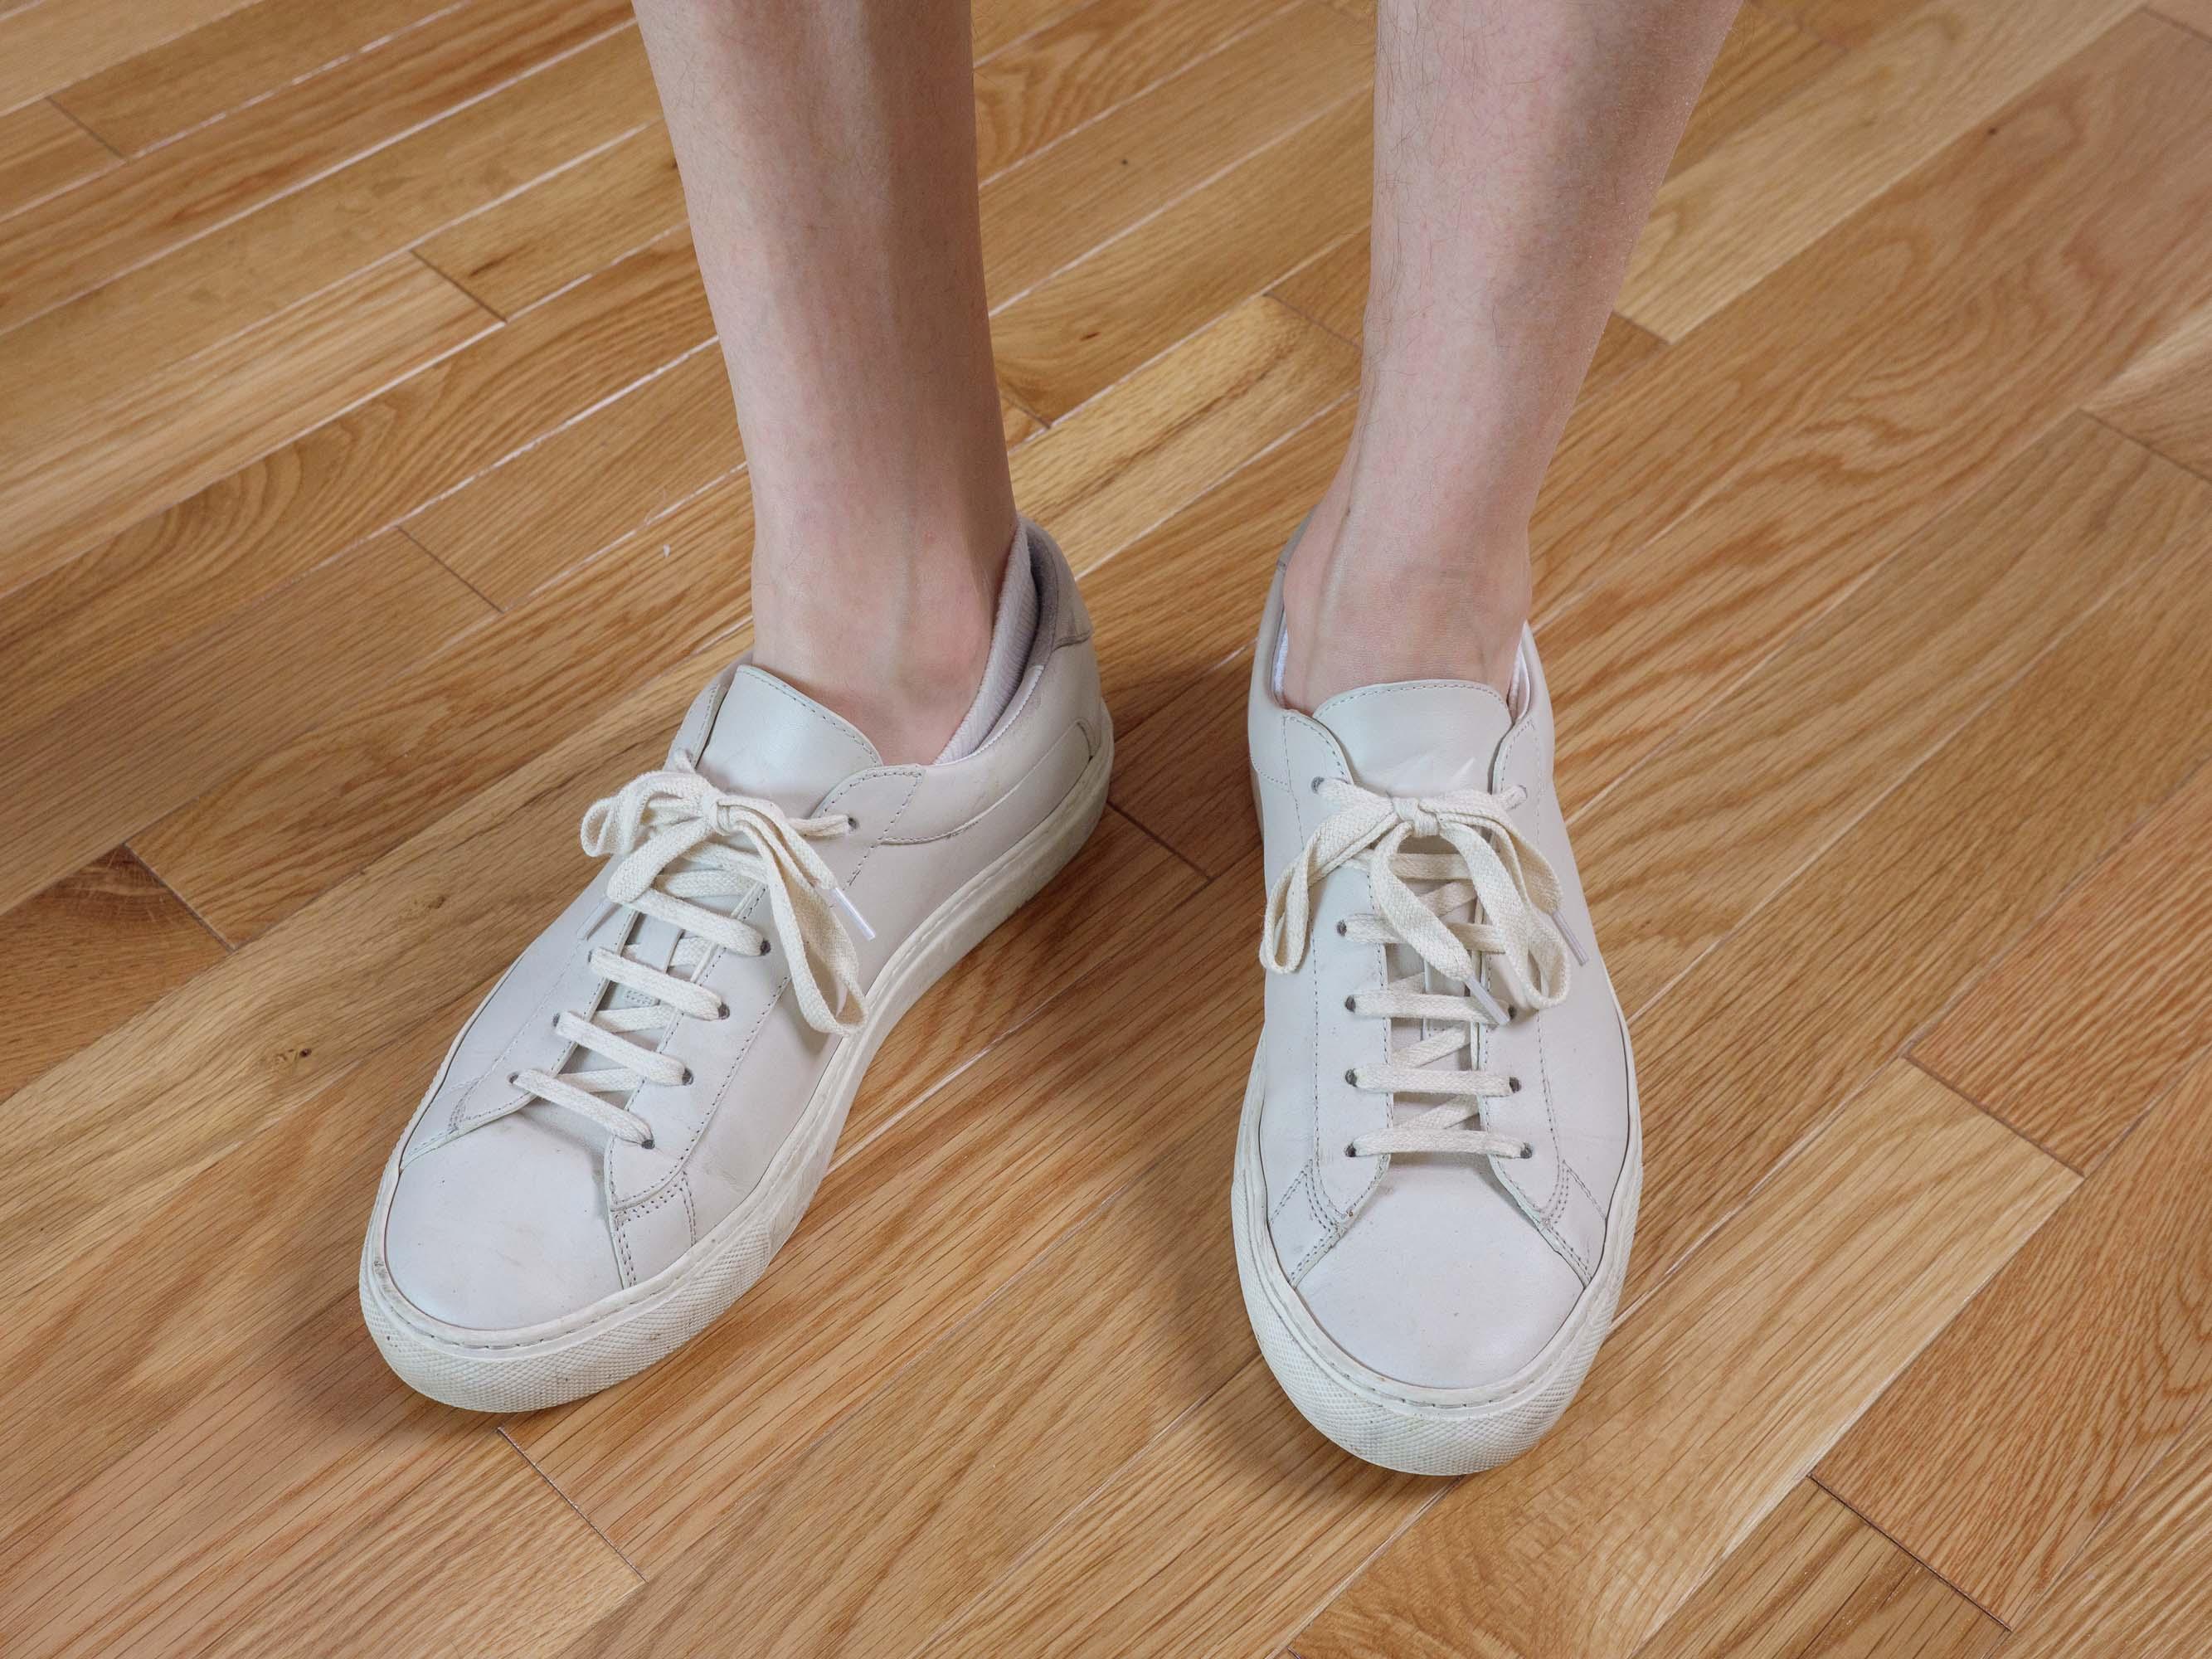 Smartwool Sneaker Cushion sneakers